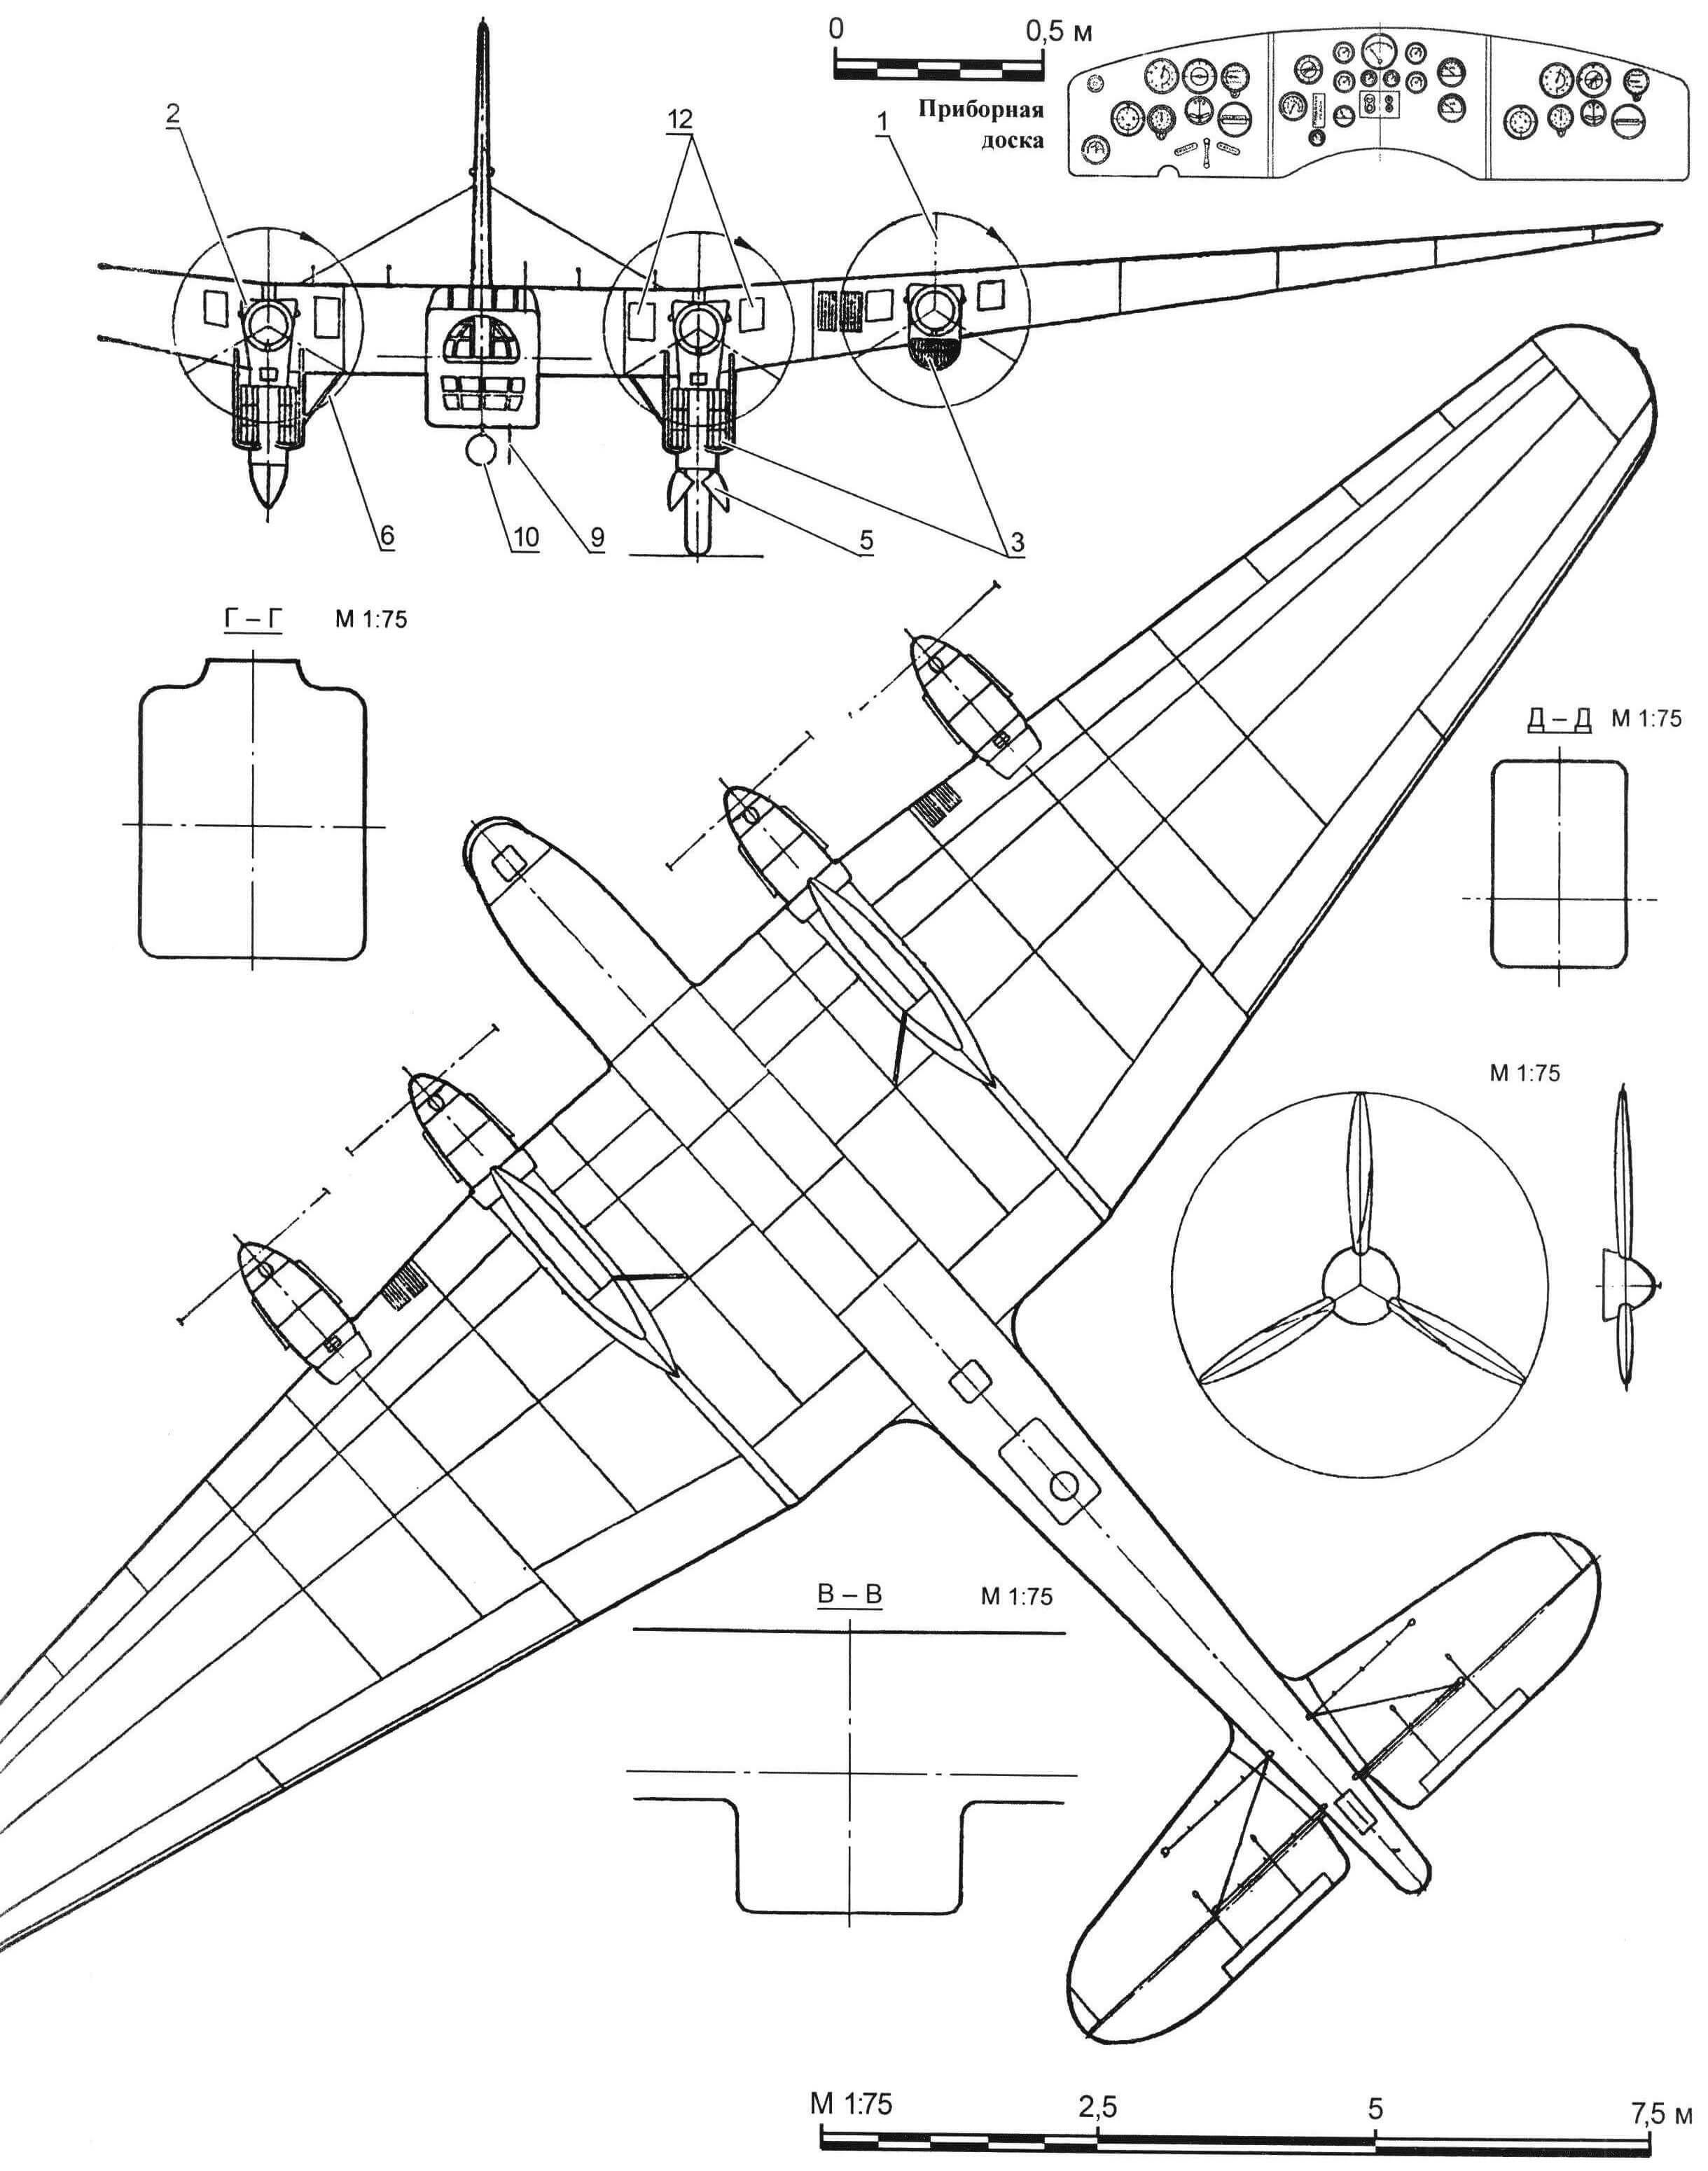 Дальний бомбардировщик ДБА